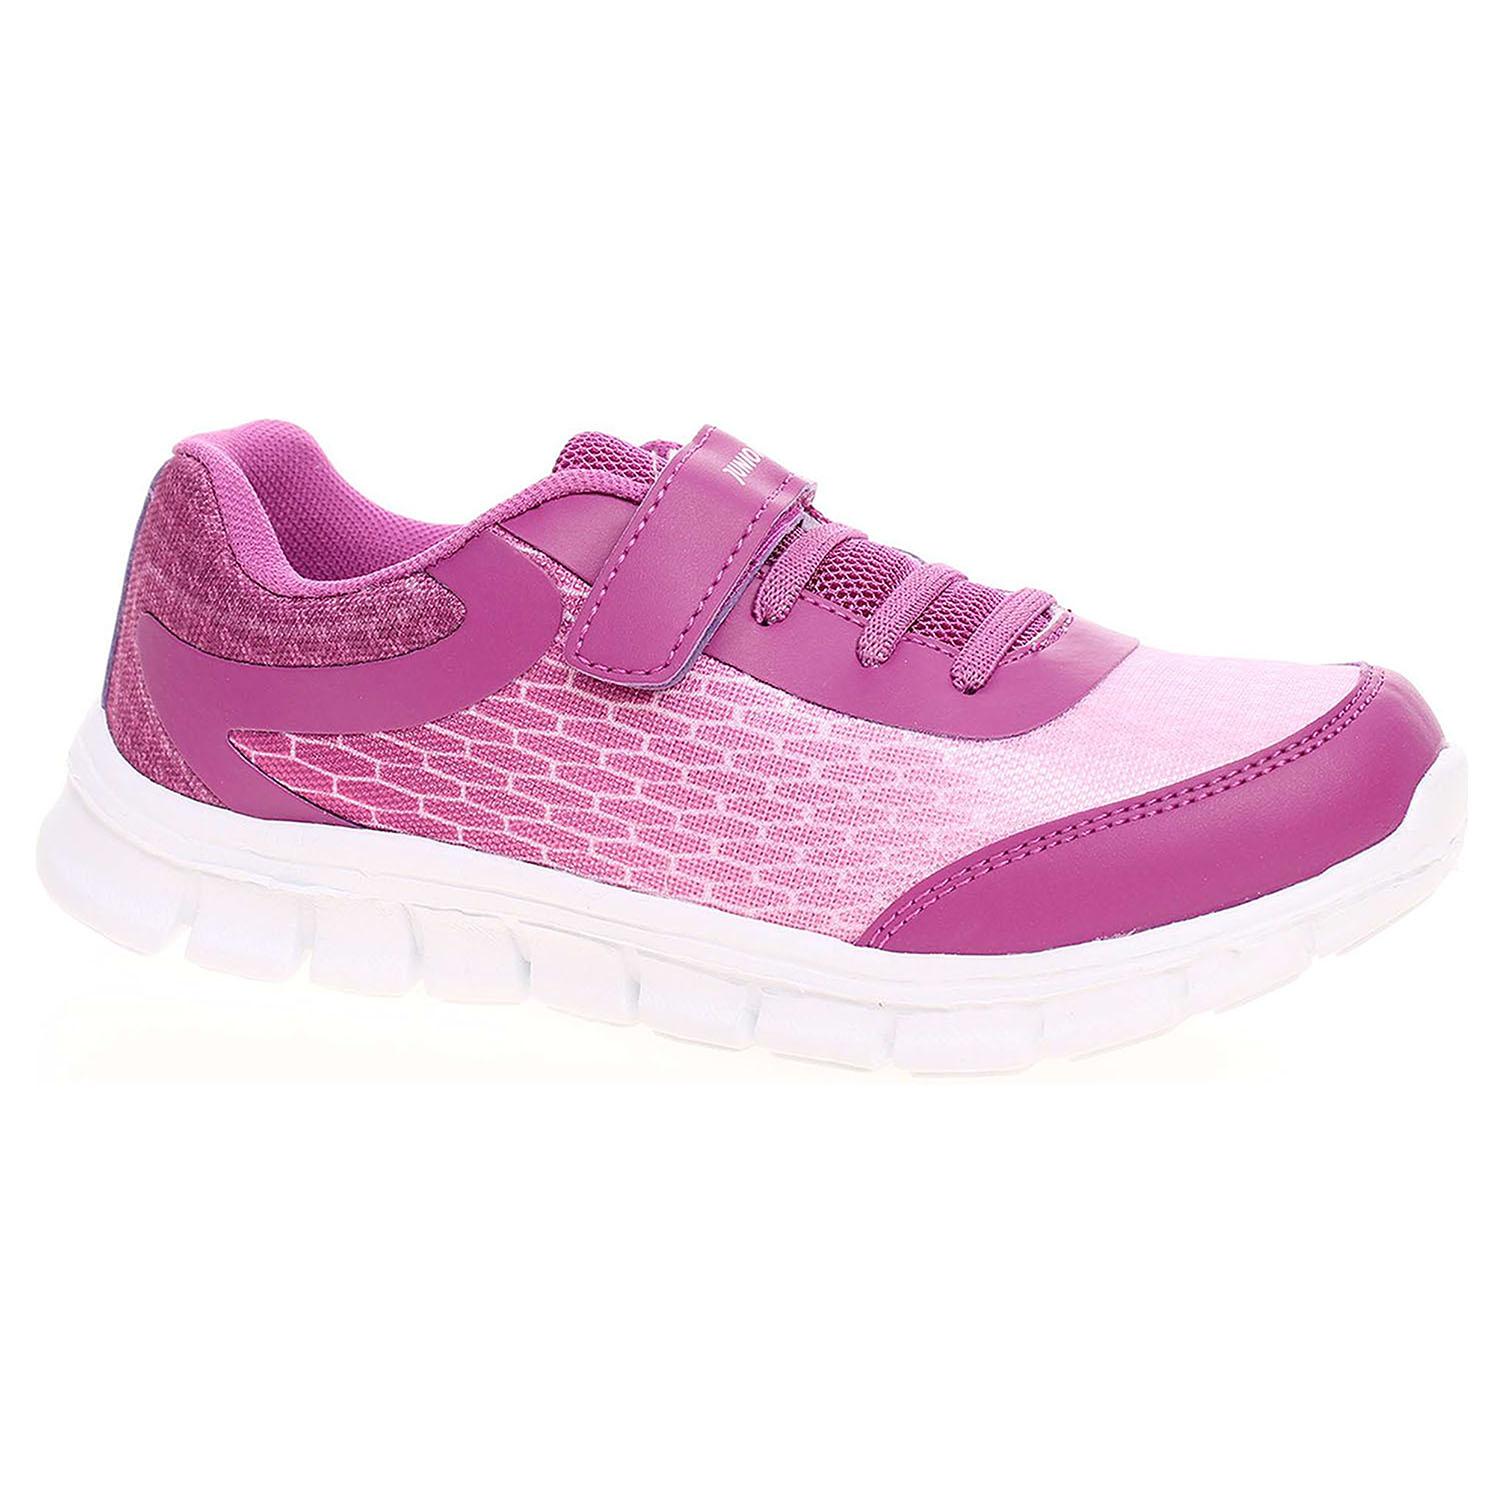 Dívčí obuv Junior League L81-128-057 purple 12805743211 31